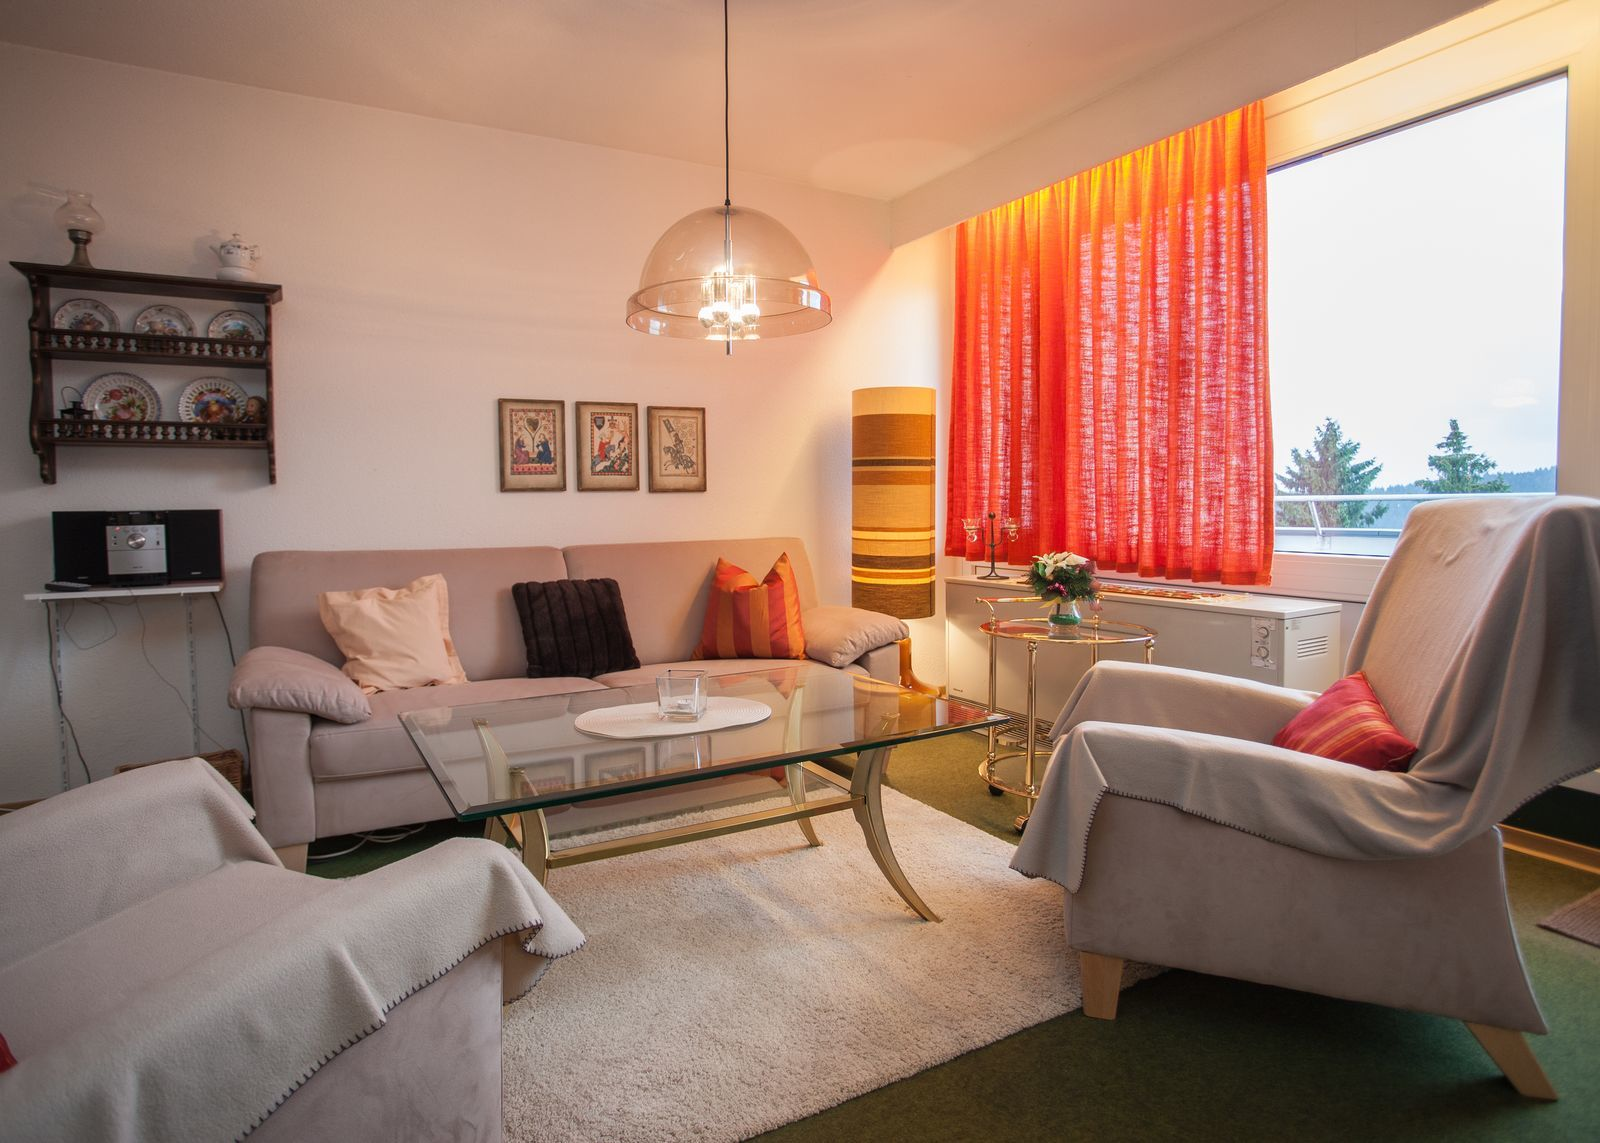 Apartment - Am Waltenberg 70-MÜ